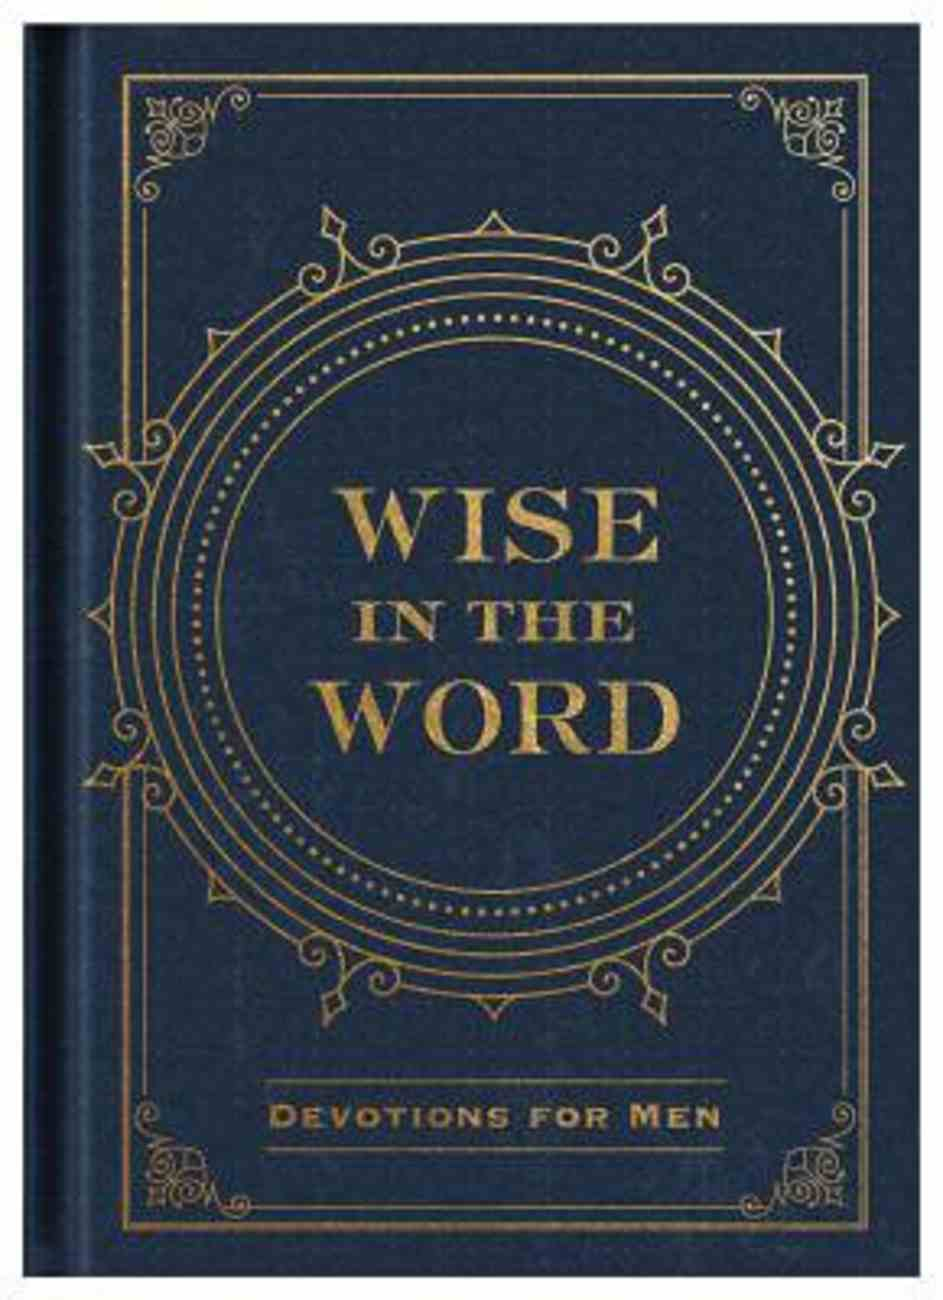 Wise in the Word: Devotions For Men Hardback